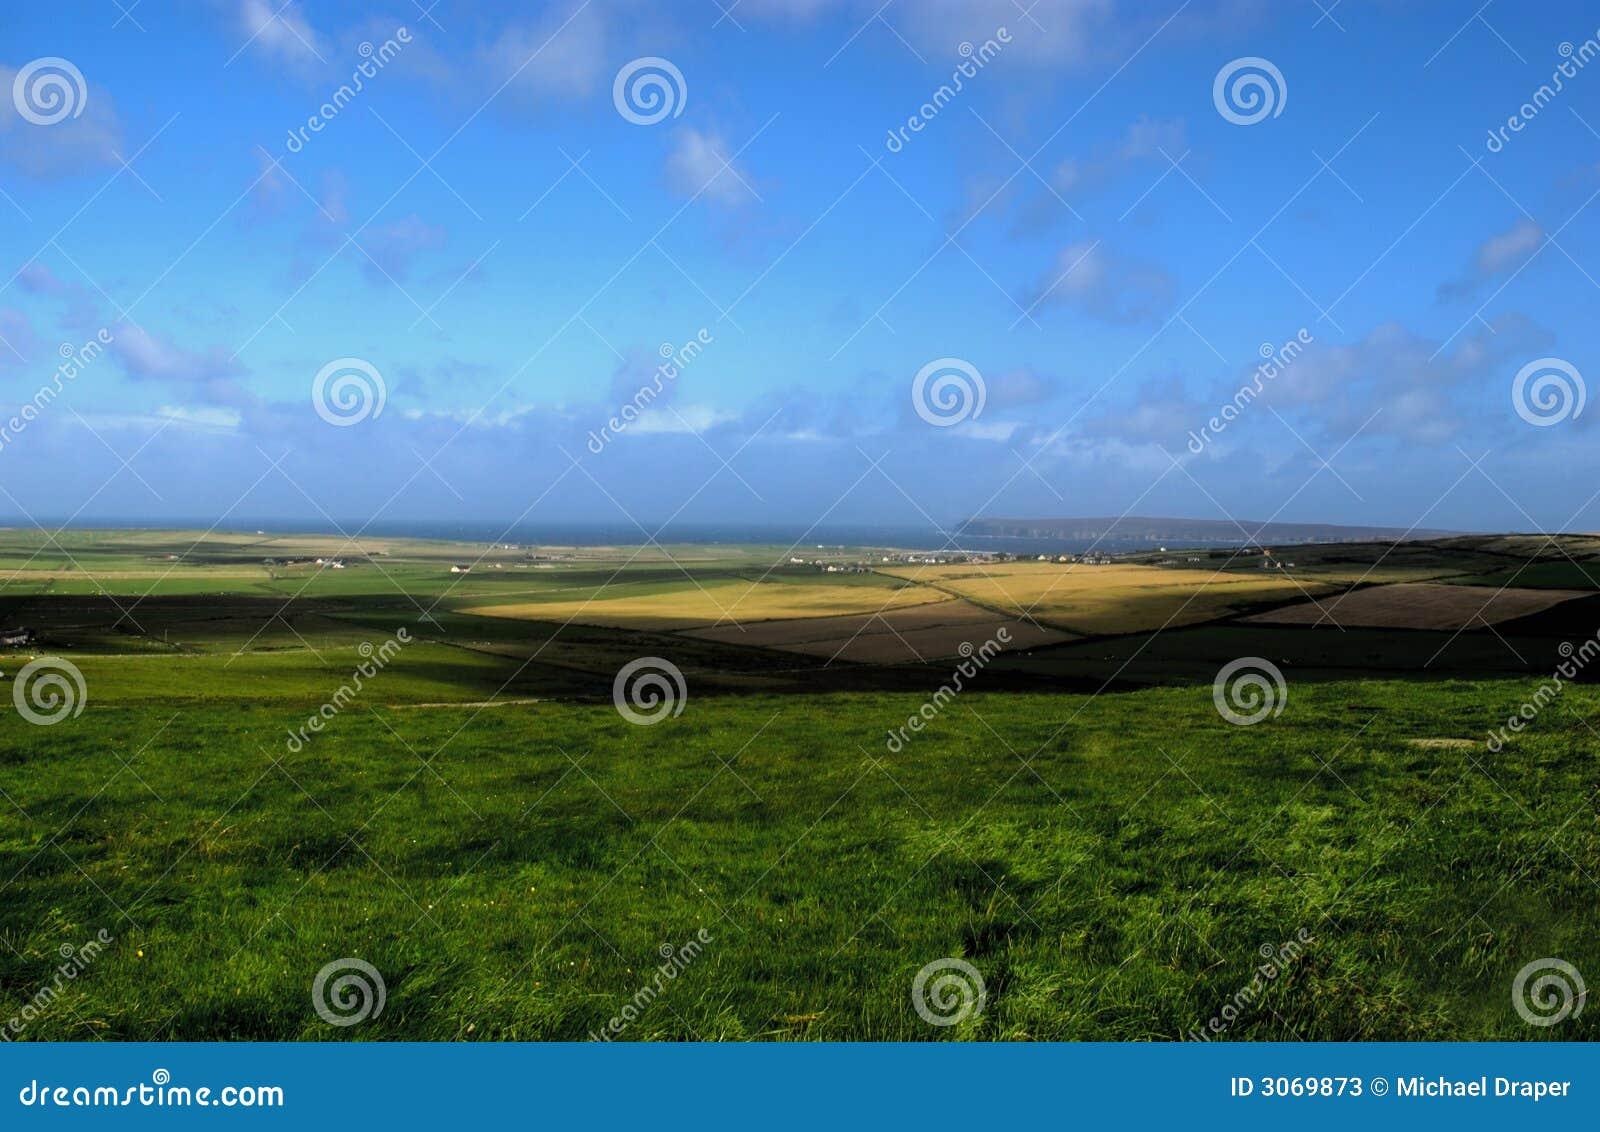 Farm land near Sea